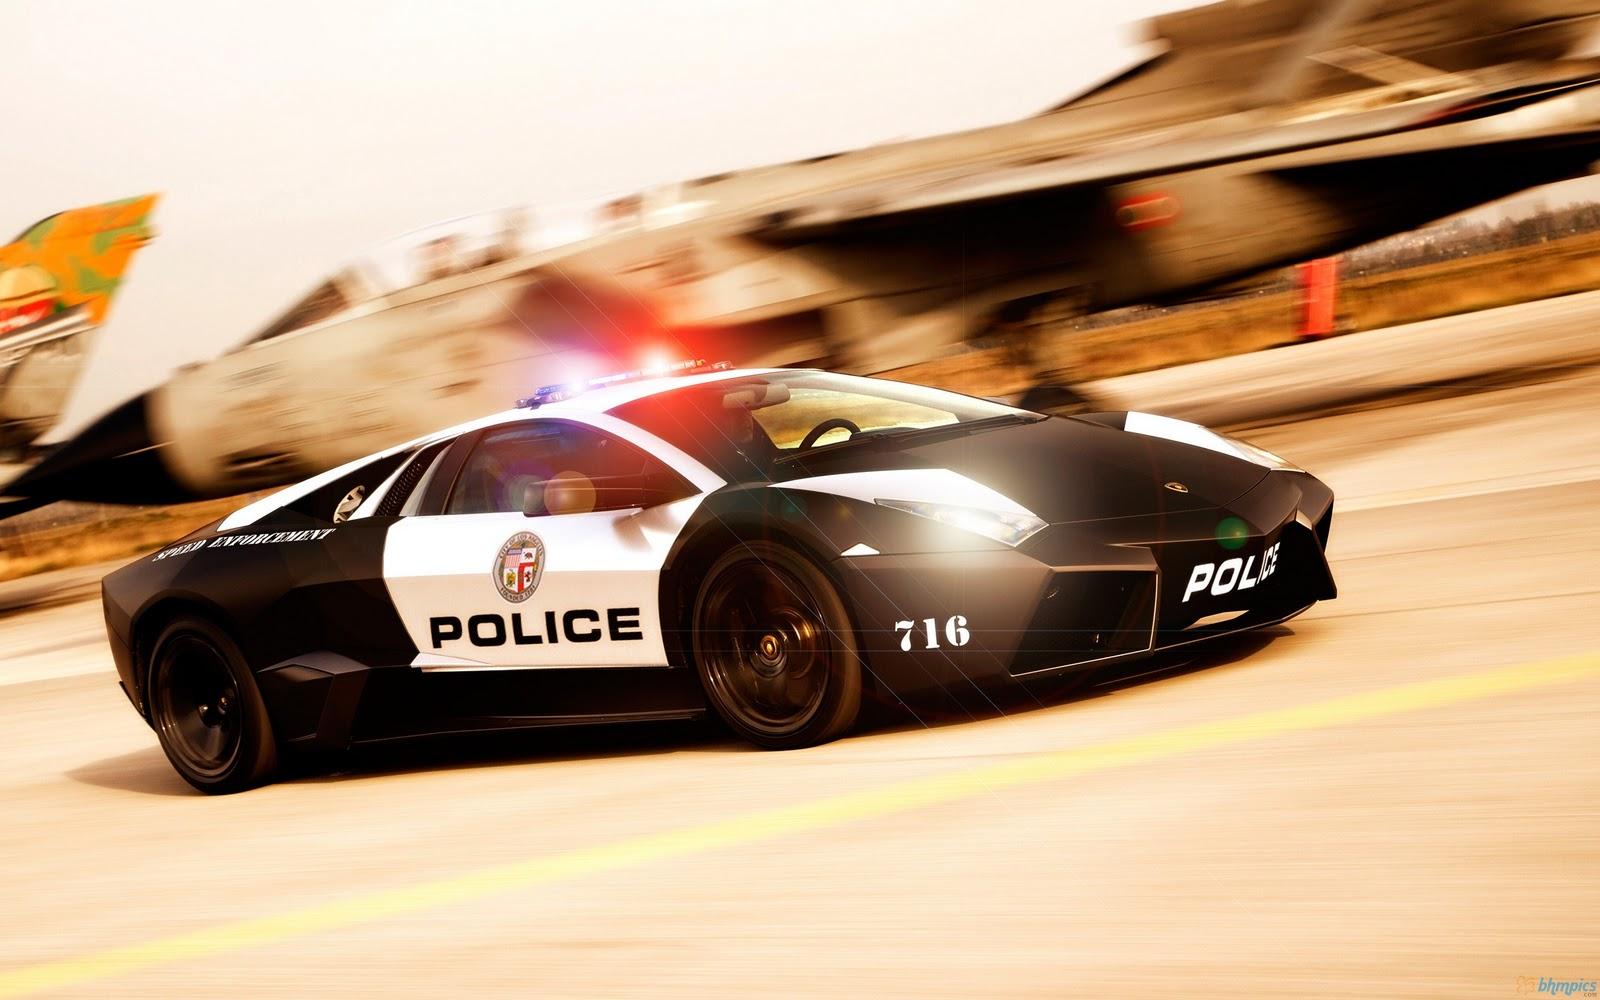 http://3.bp.blogspot.com/-dl-f_edd0Rc/Tr6VRGQTzyI/AAAAAAAAA7U/Eu6bEFfvDlY/s1600/nfs_police_car-2560x1600.jpg